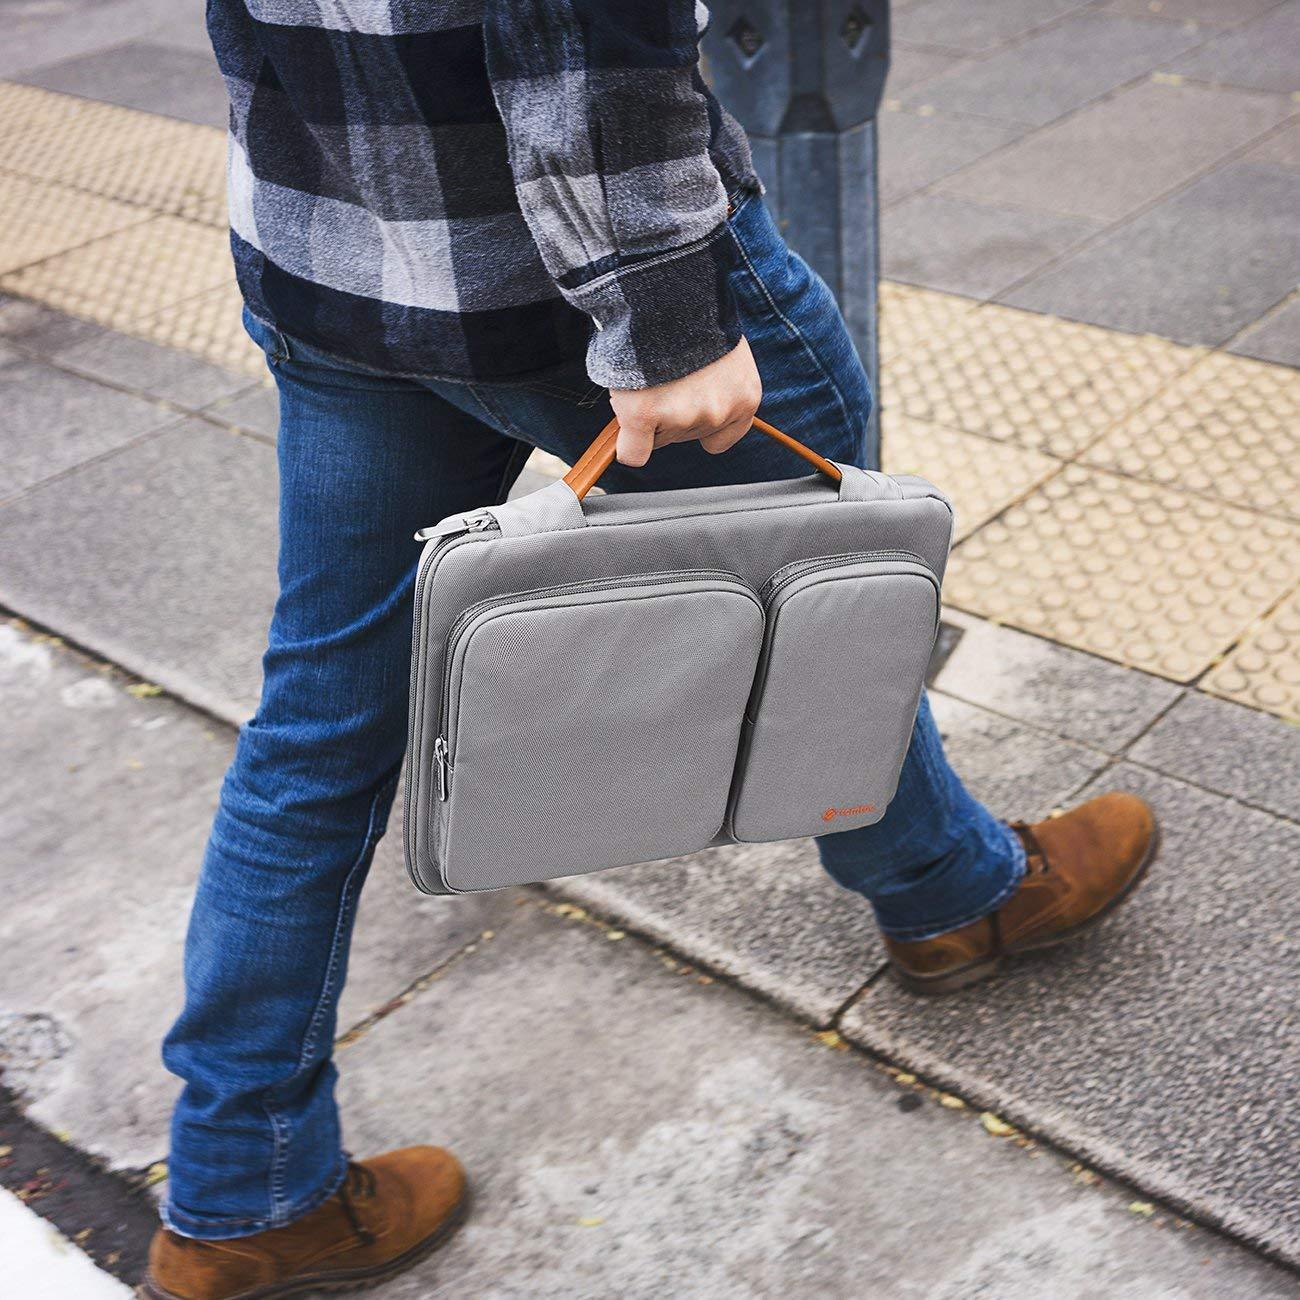 tomtoc Funda para port/átil Compatible MacBook Air de 2018 de 13 Pulgadas con Pantalla Retina MacBook Pro de 13 Pulgadas Malet/ín para Port/átil Resistente Al Agua Surface Pro 6